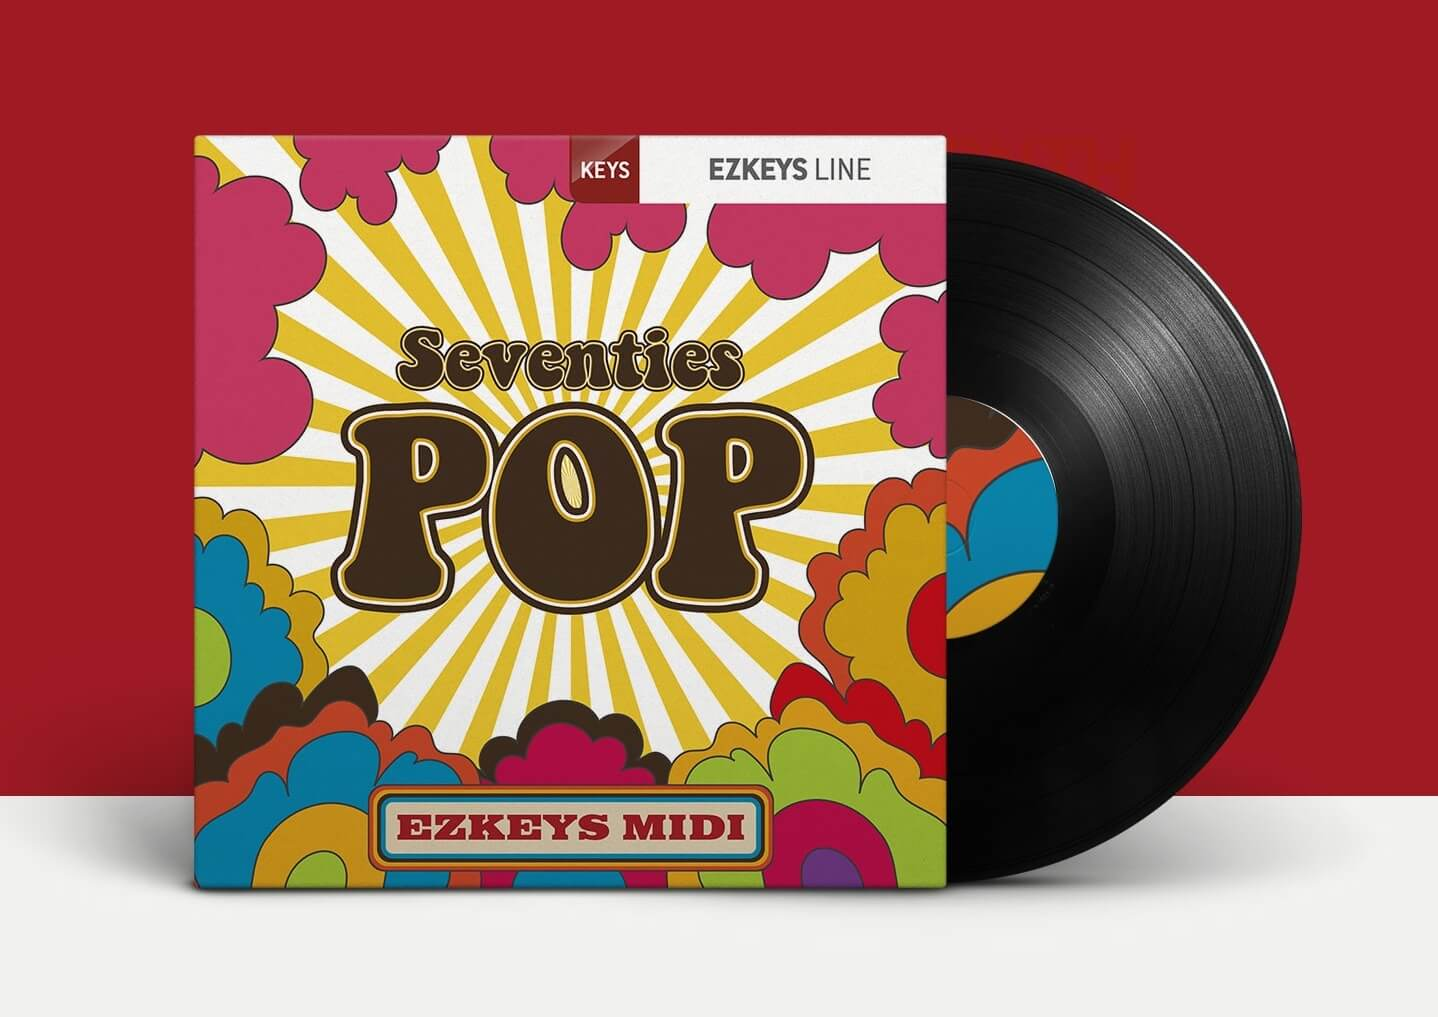 Toontrack releases Seventies Pop EZkeys MIDI pack